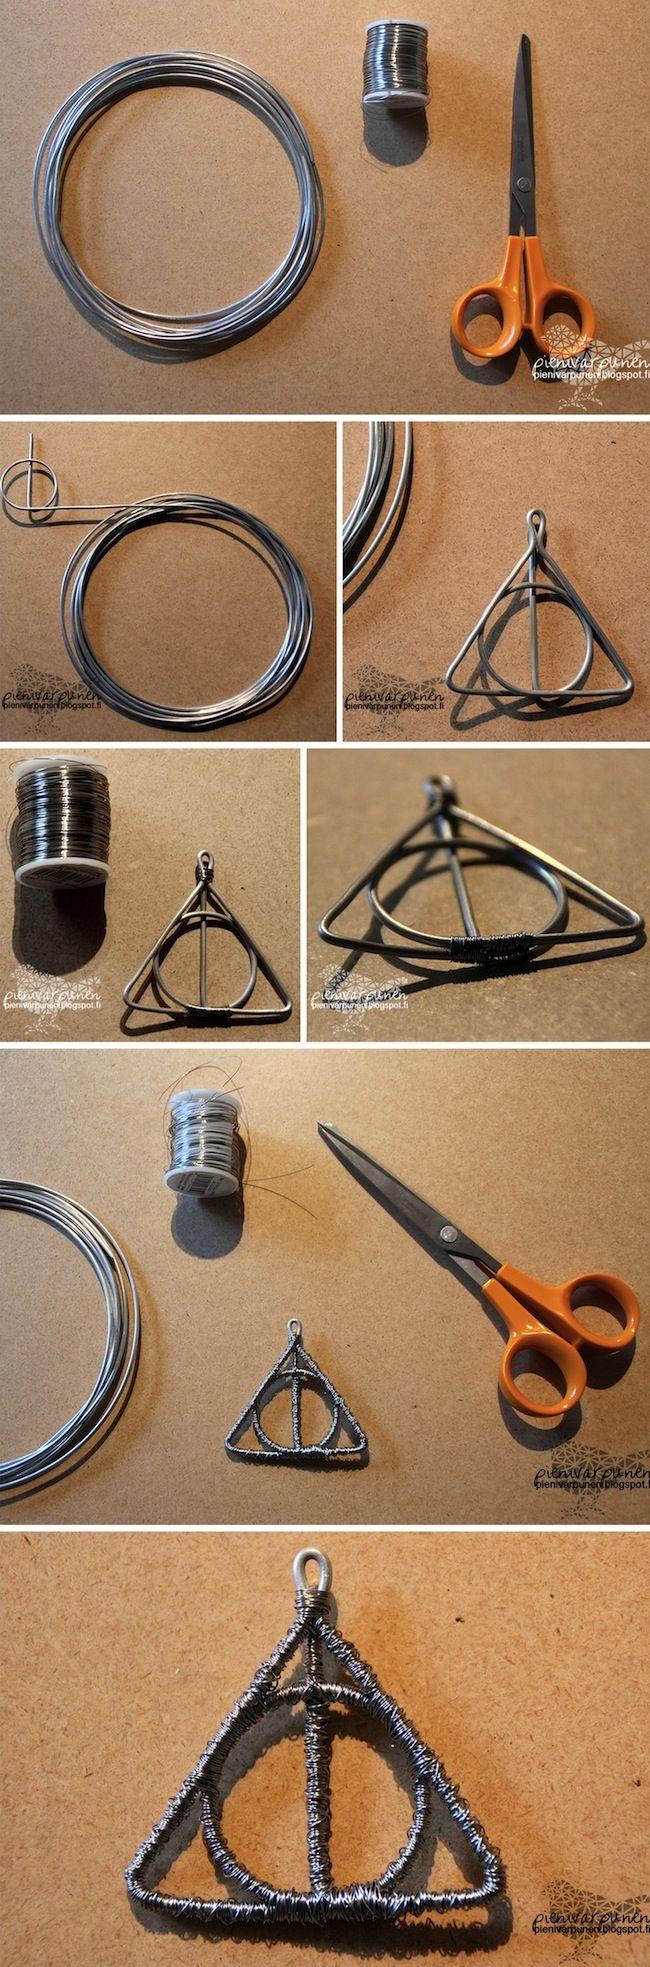 DIY Harry Potter Deadly Hallows pendant! Materials that I used: aluminum wire and silver-plated copper wire.  The original DIY instructions: http://pienivarpunen.blogspot.fi/2013/08/diy-riipuksia-alumiinilangasta-arvonta.html